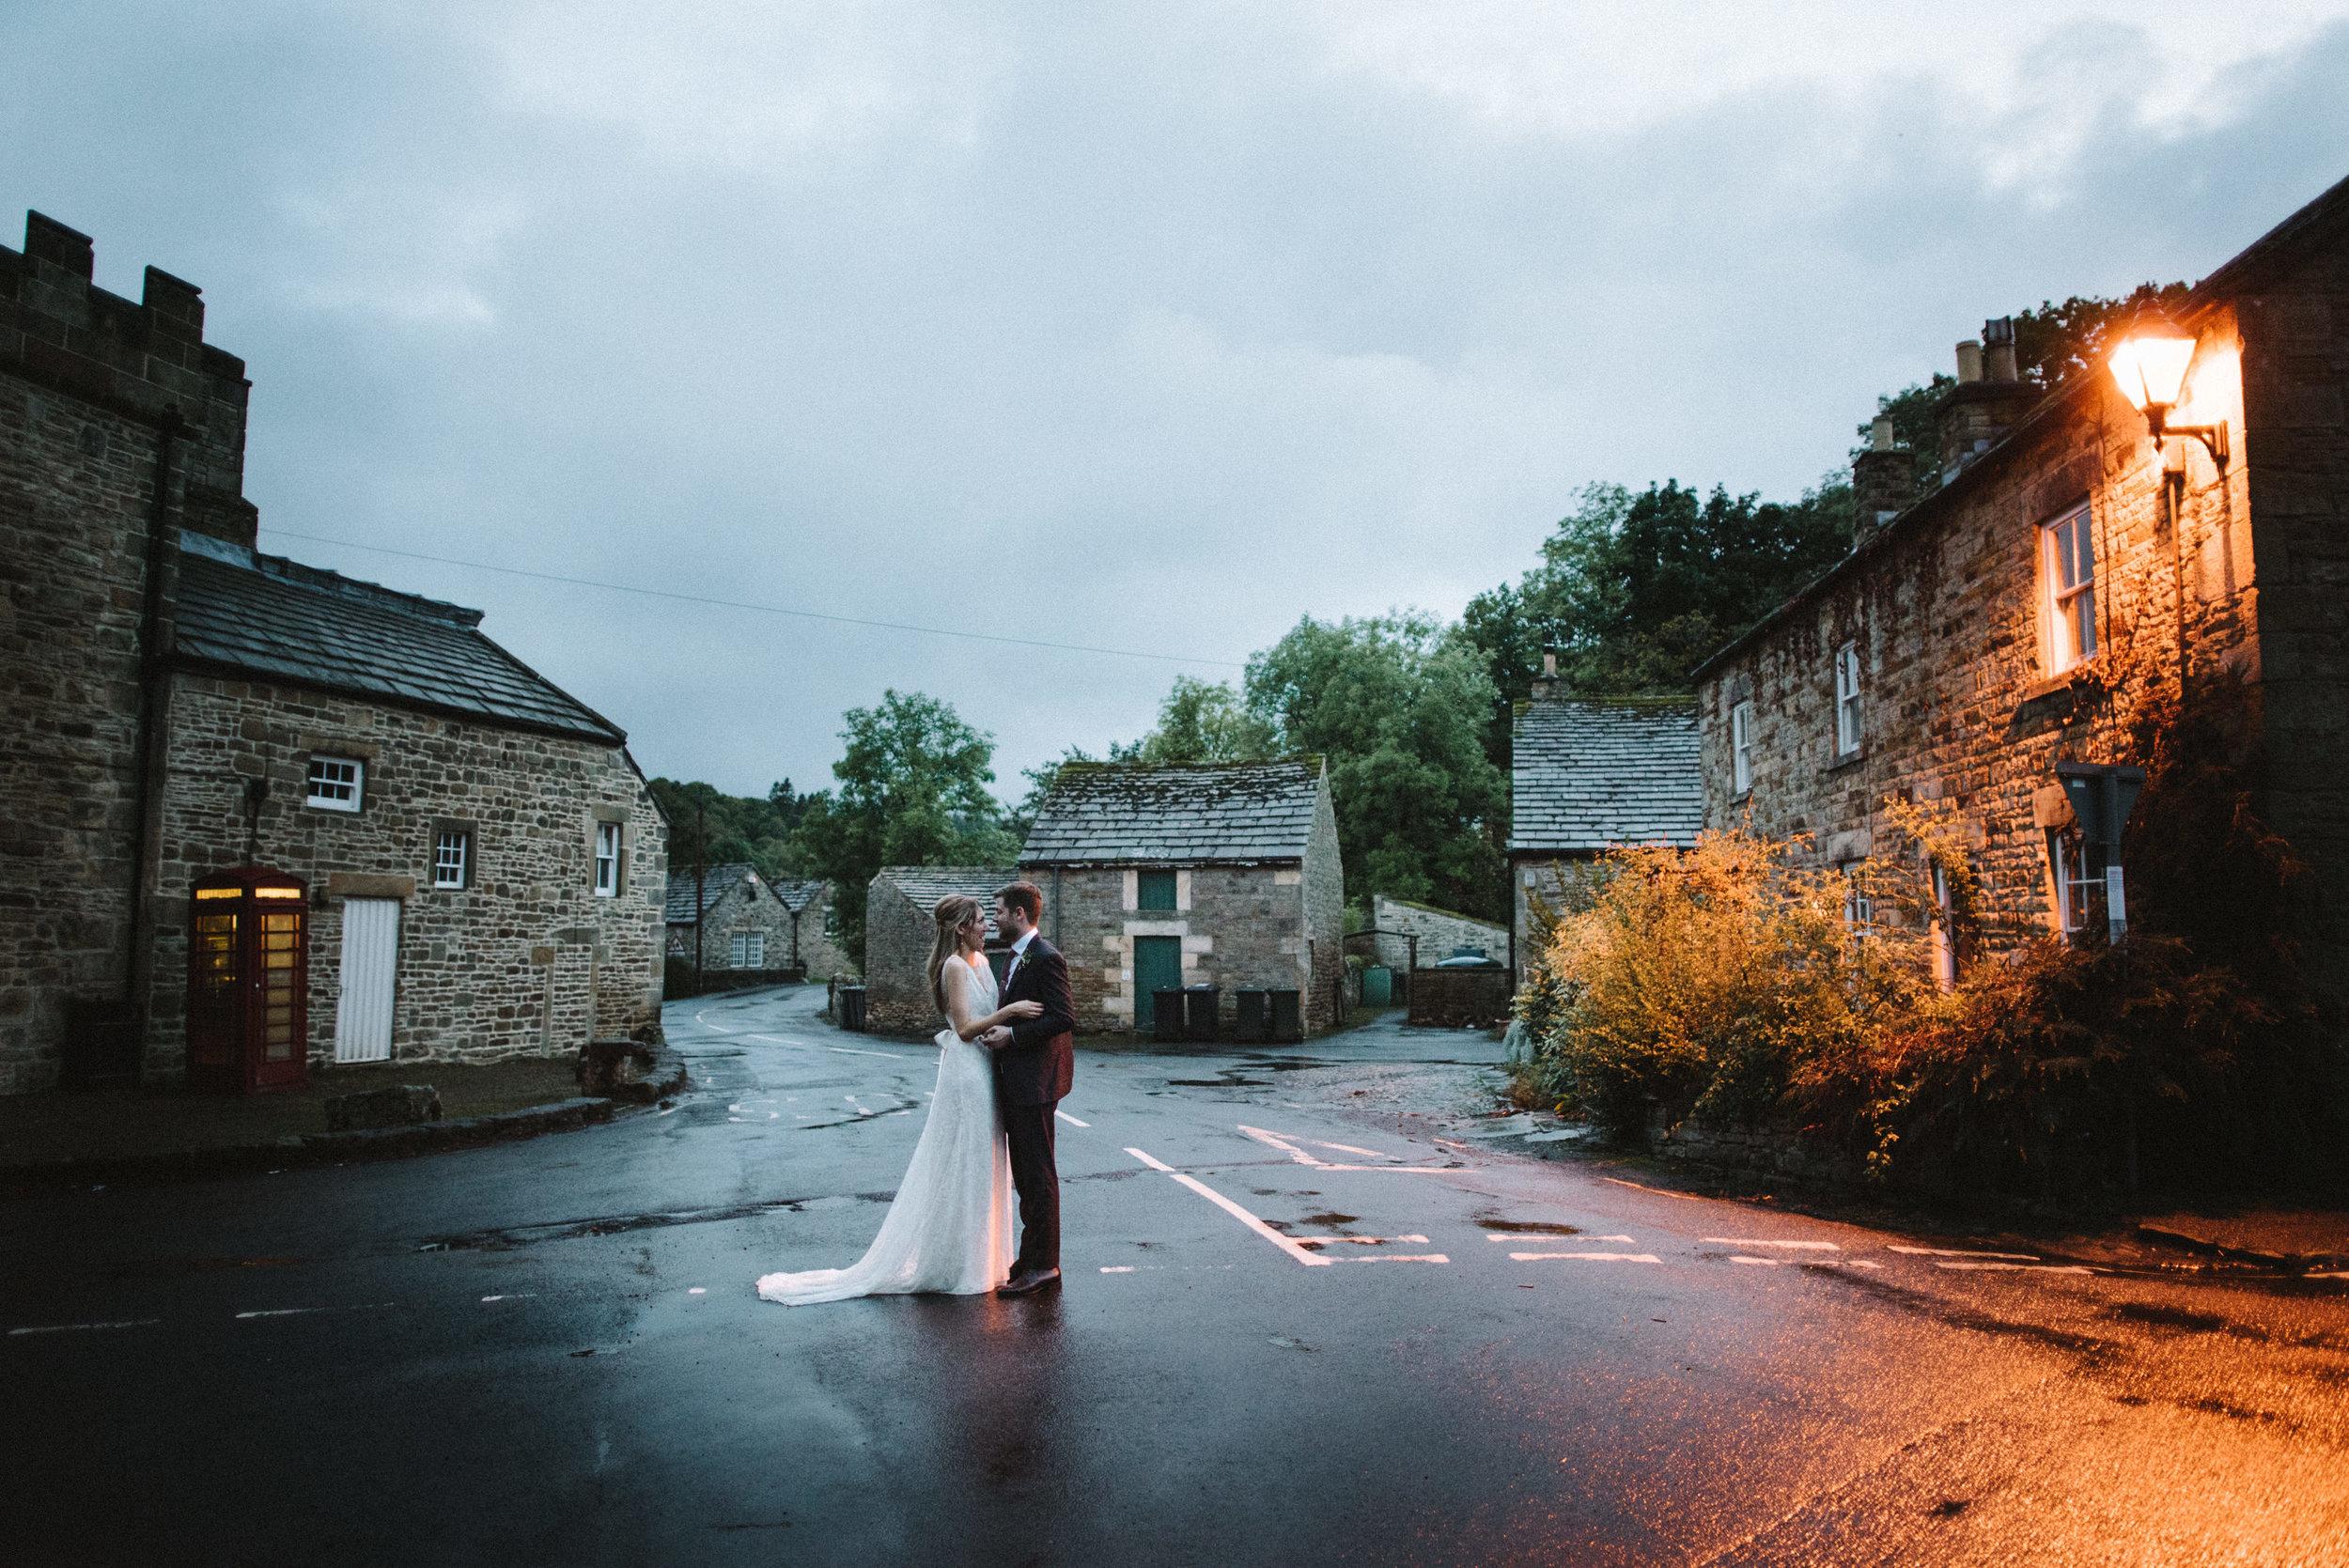 0204-LISA-DEVINE-PHOTOGRAPHY-ALTERNATIVE-WEDDING-PHOTOGRAPHY-SCOTLAND-DESTINATION-WEDDINGS-GLASGOW-WEDDINGS-COOL-WEDDINGS-STYLISH-WEDDINGS.JPG